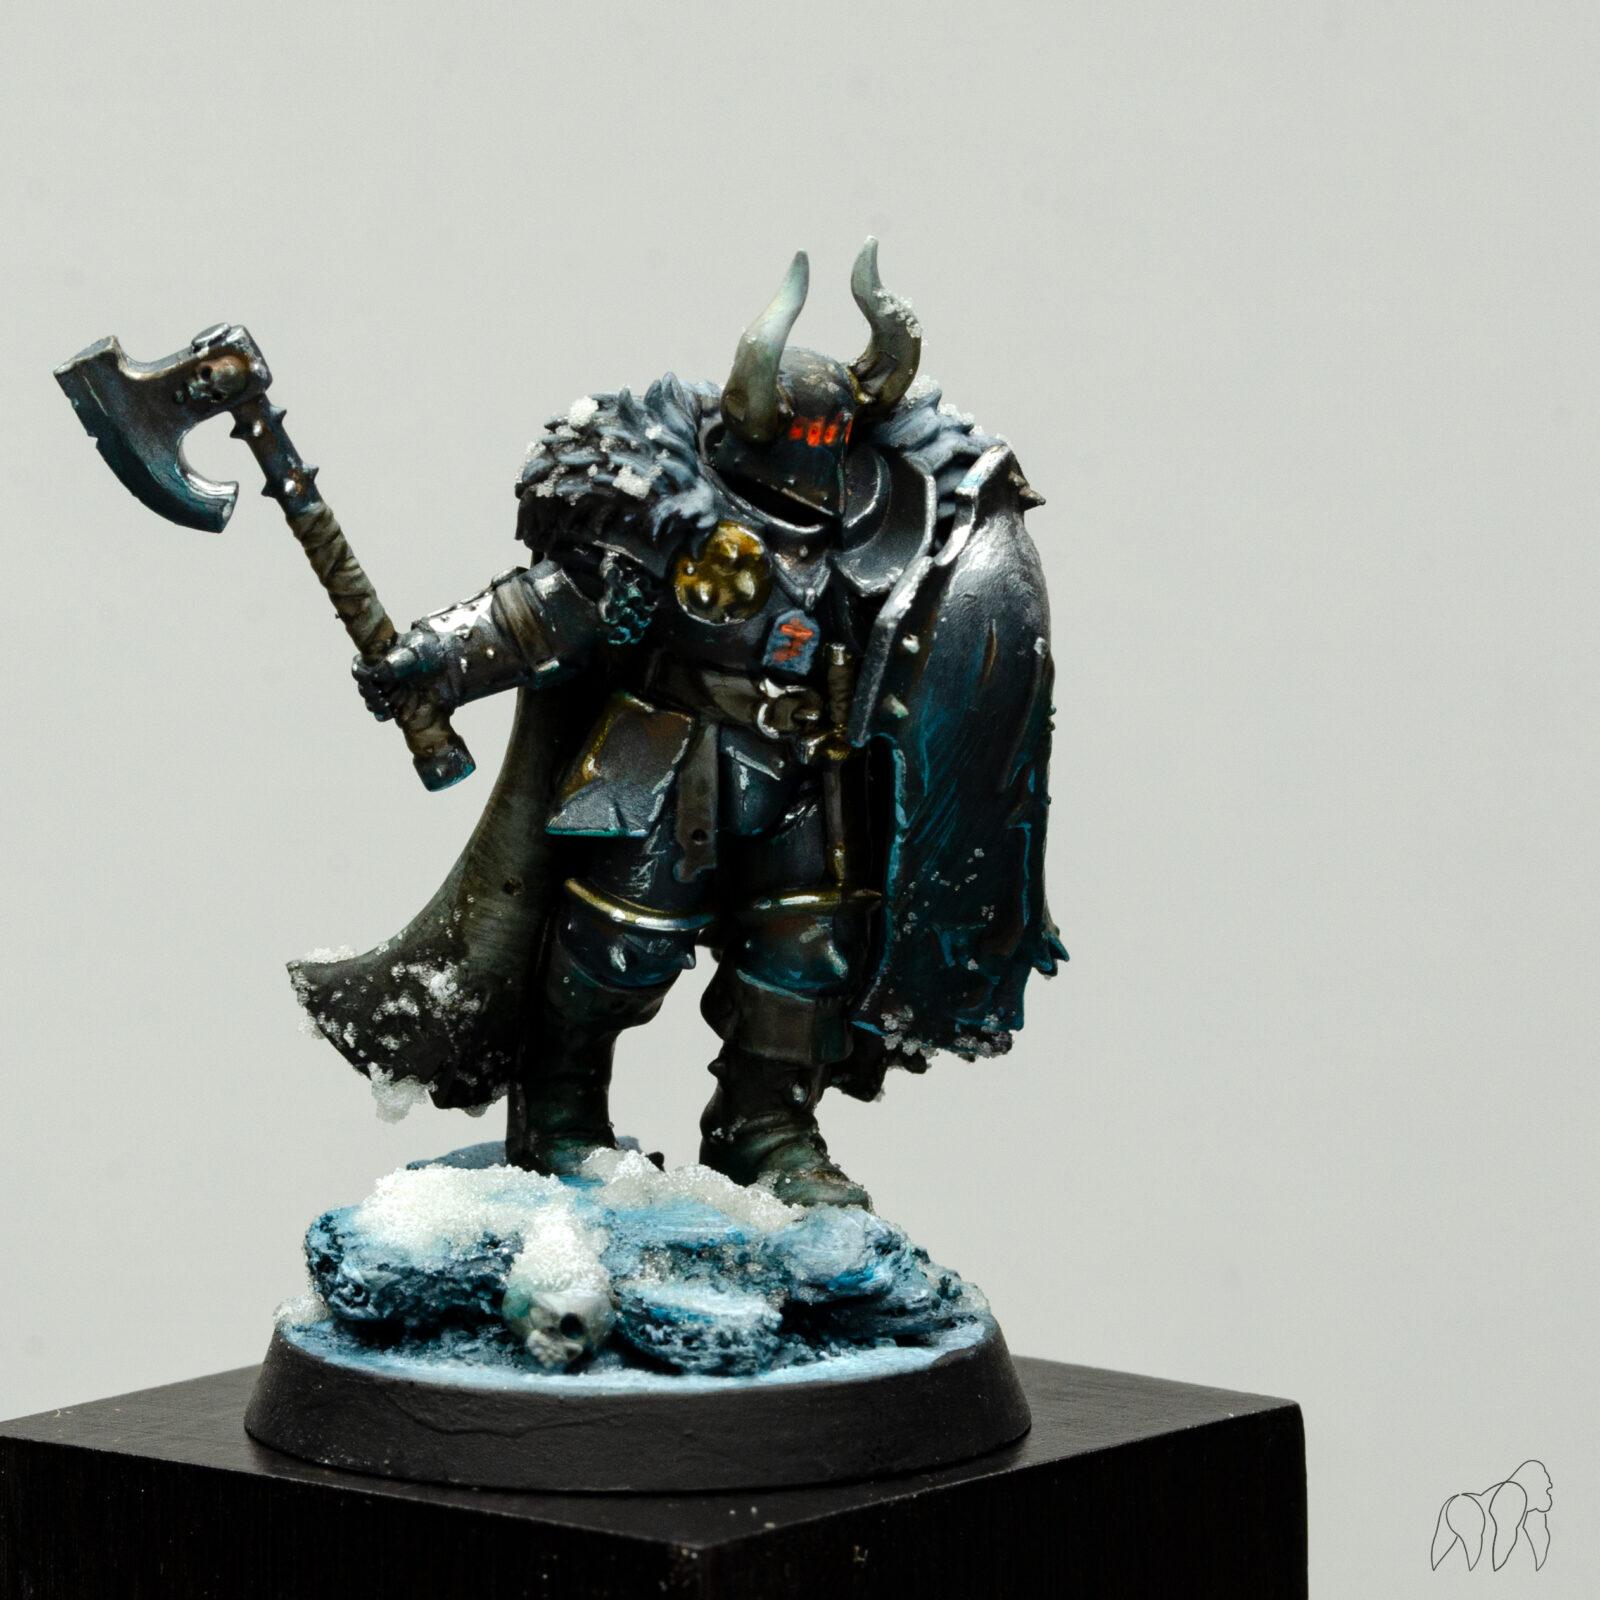 Chaoswarrior03